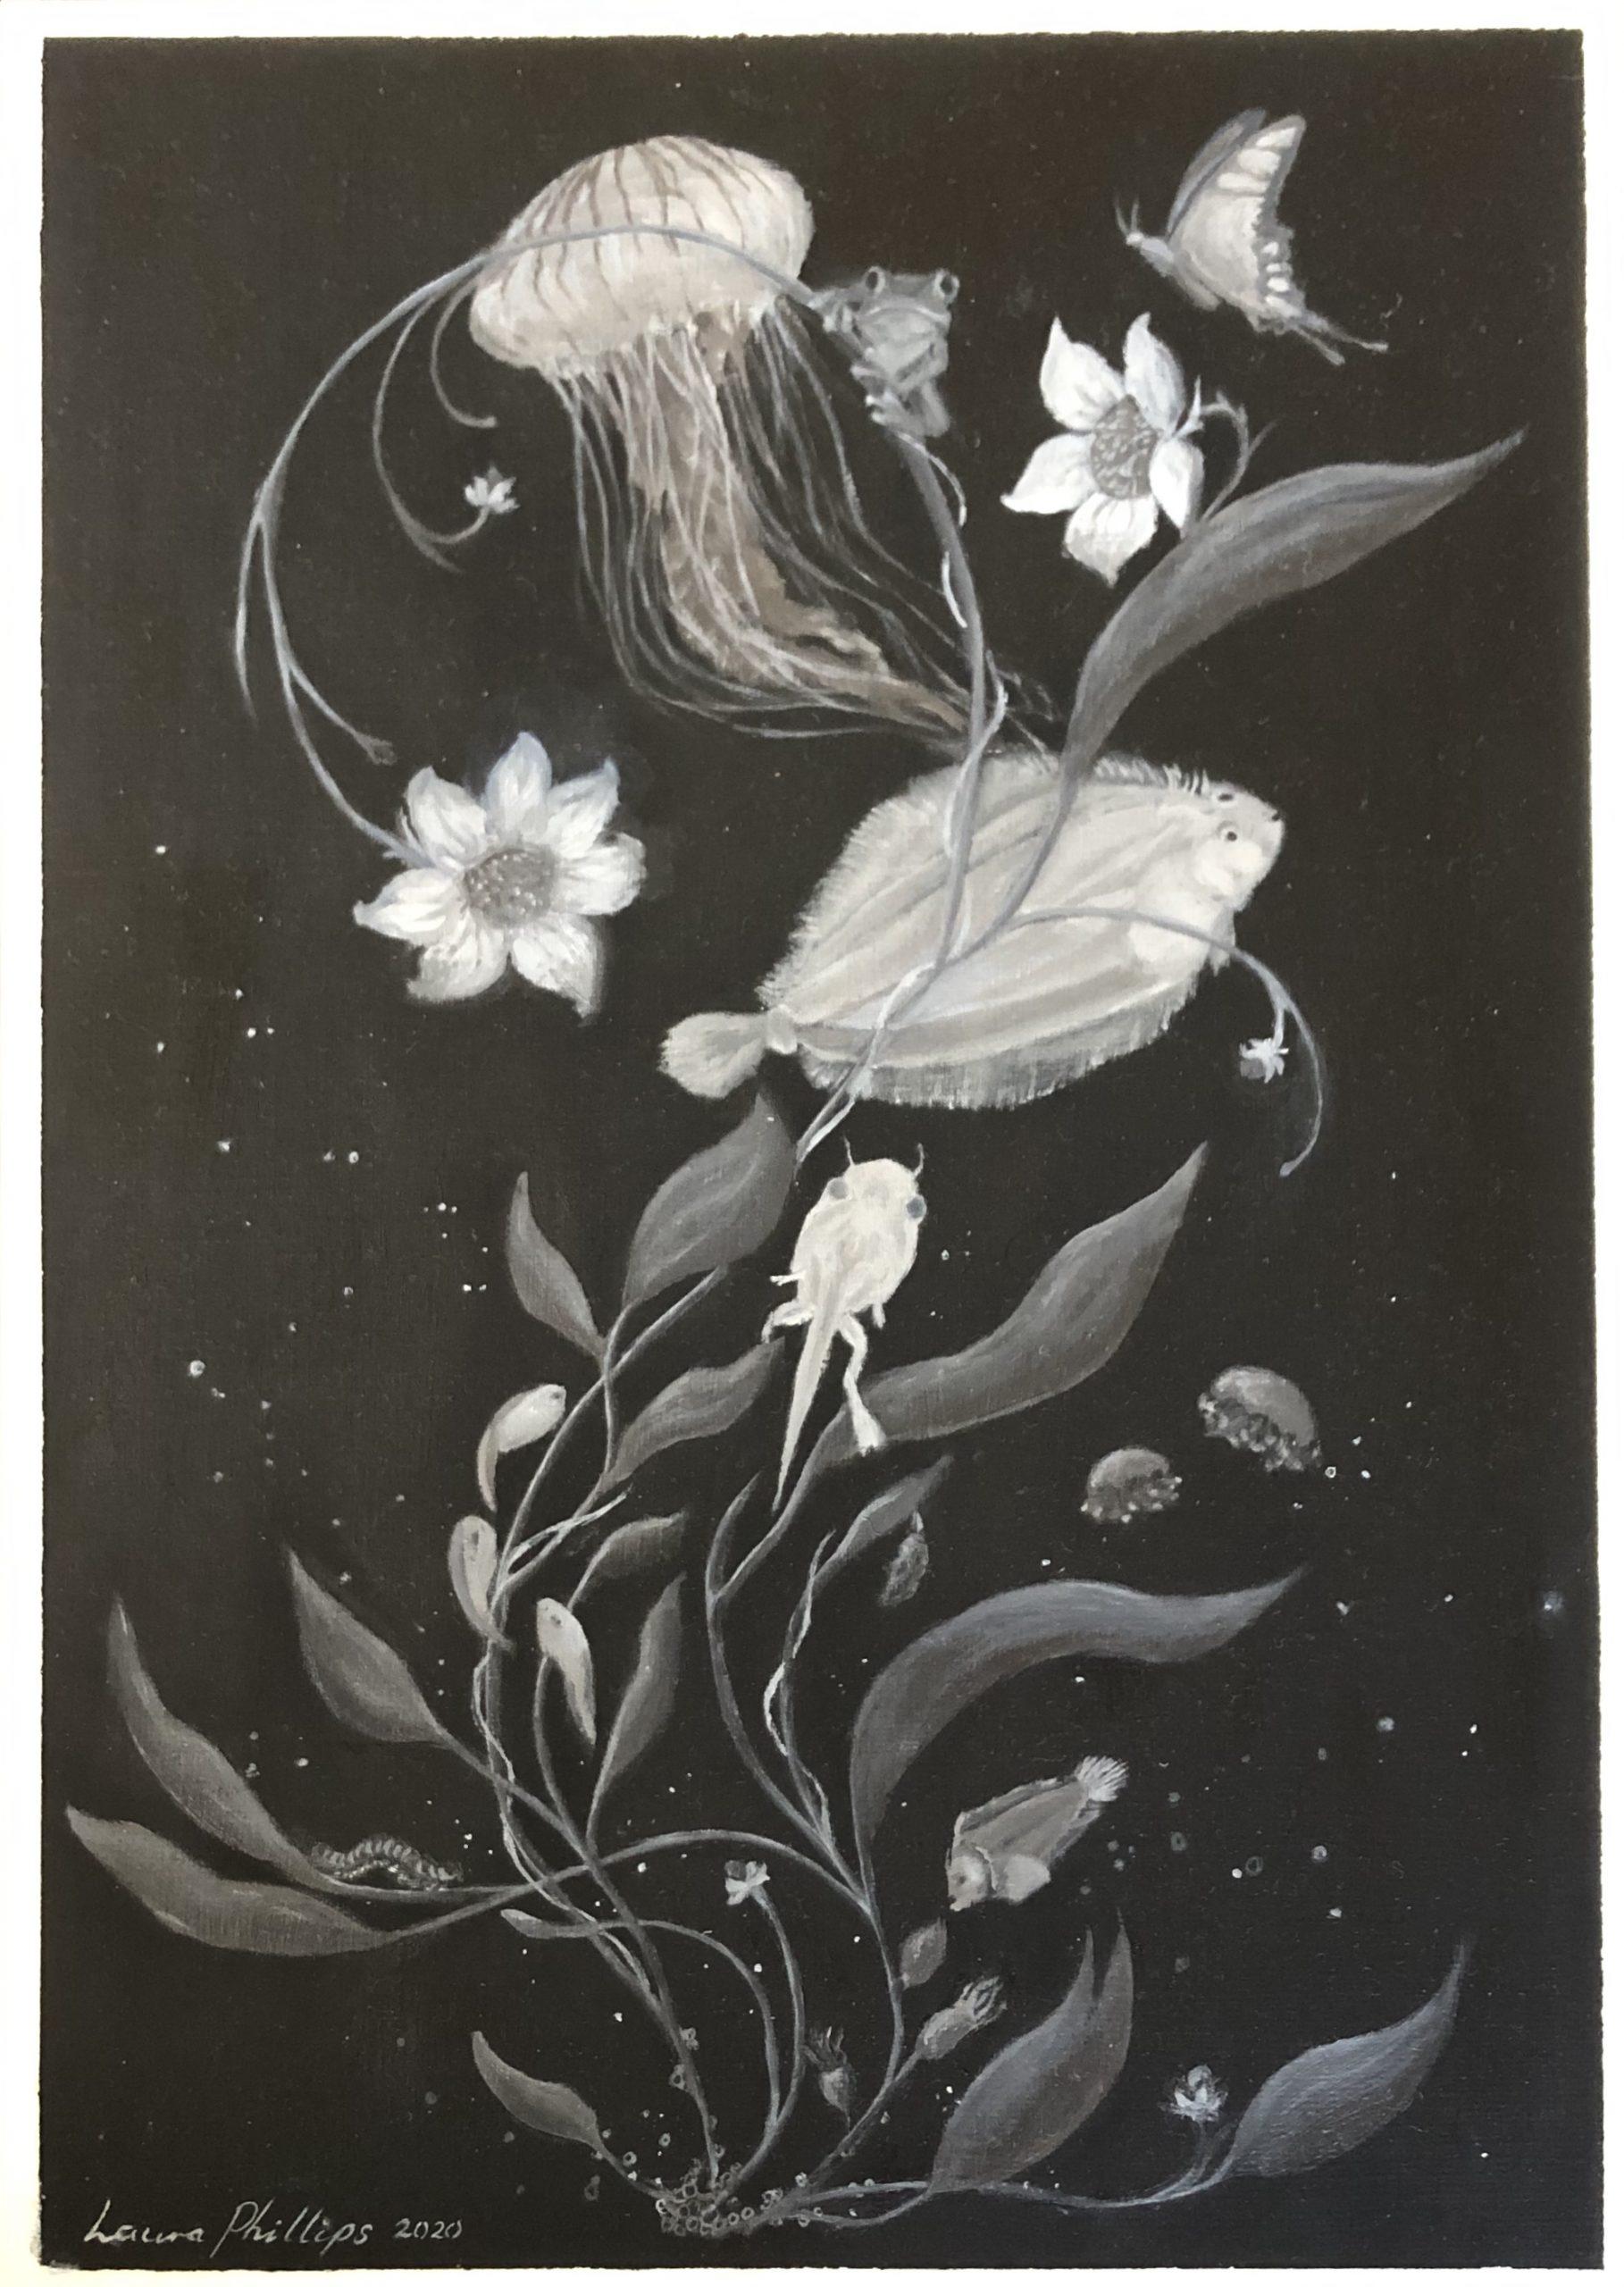 (153) Laura Phillips - Metamorphosis Image